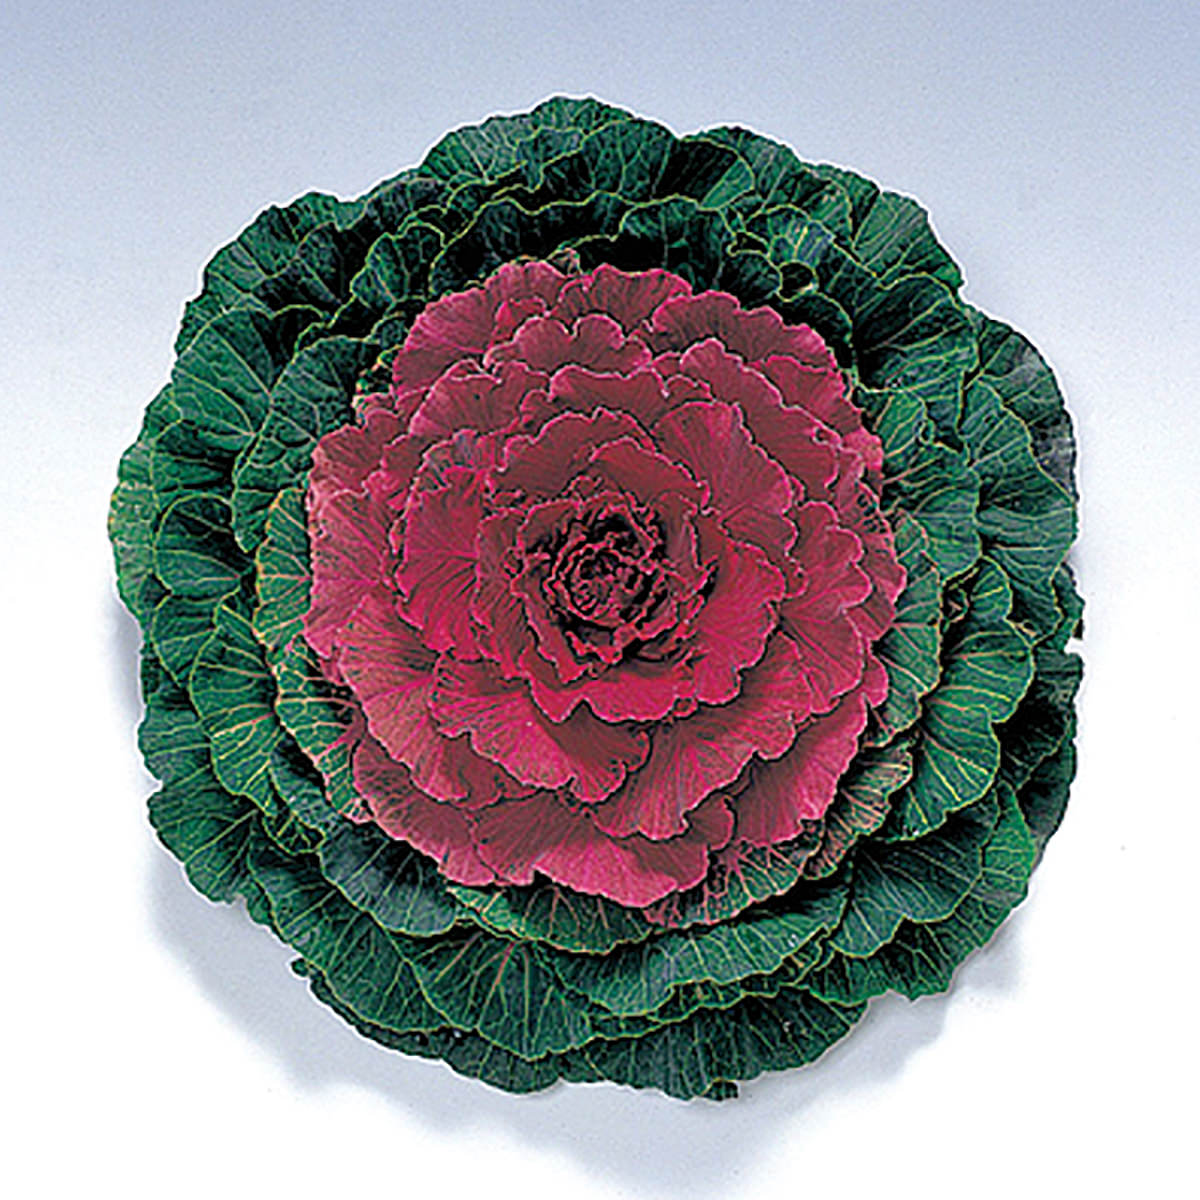 Pigeon Red F1 Hybrid Ornamental Flowering Cabbage Kale